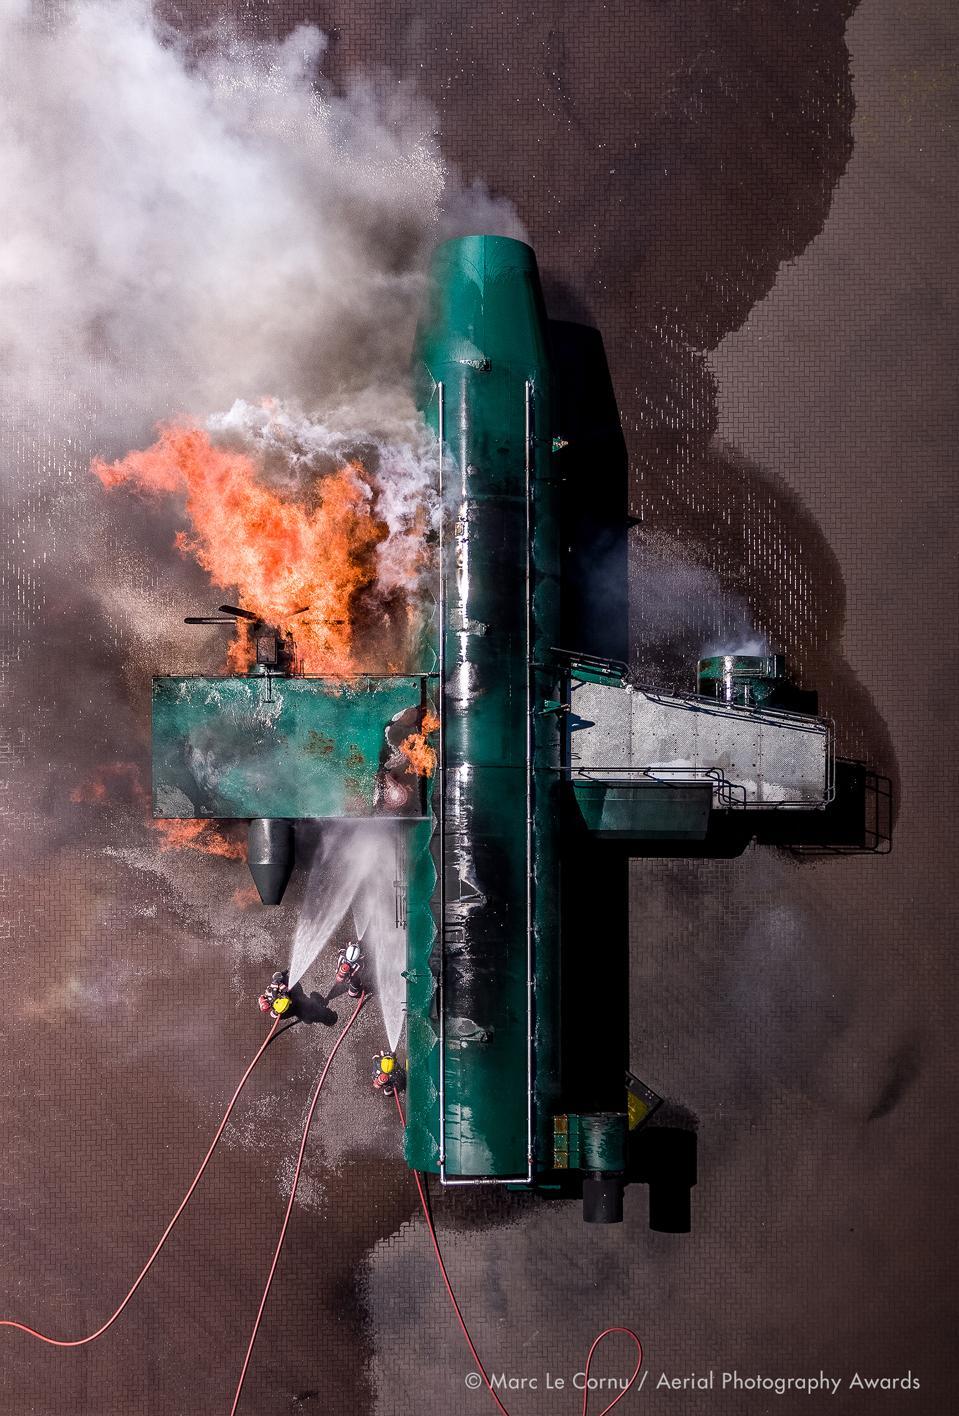 Documentary photo Aerial Photography Awards 2020